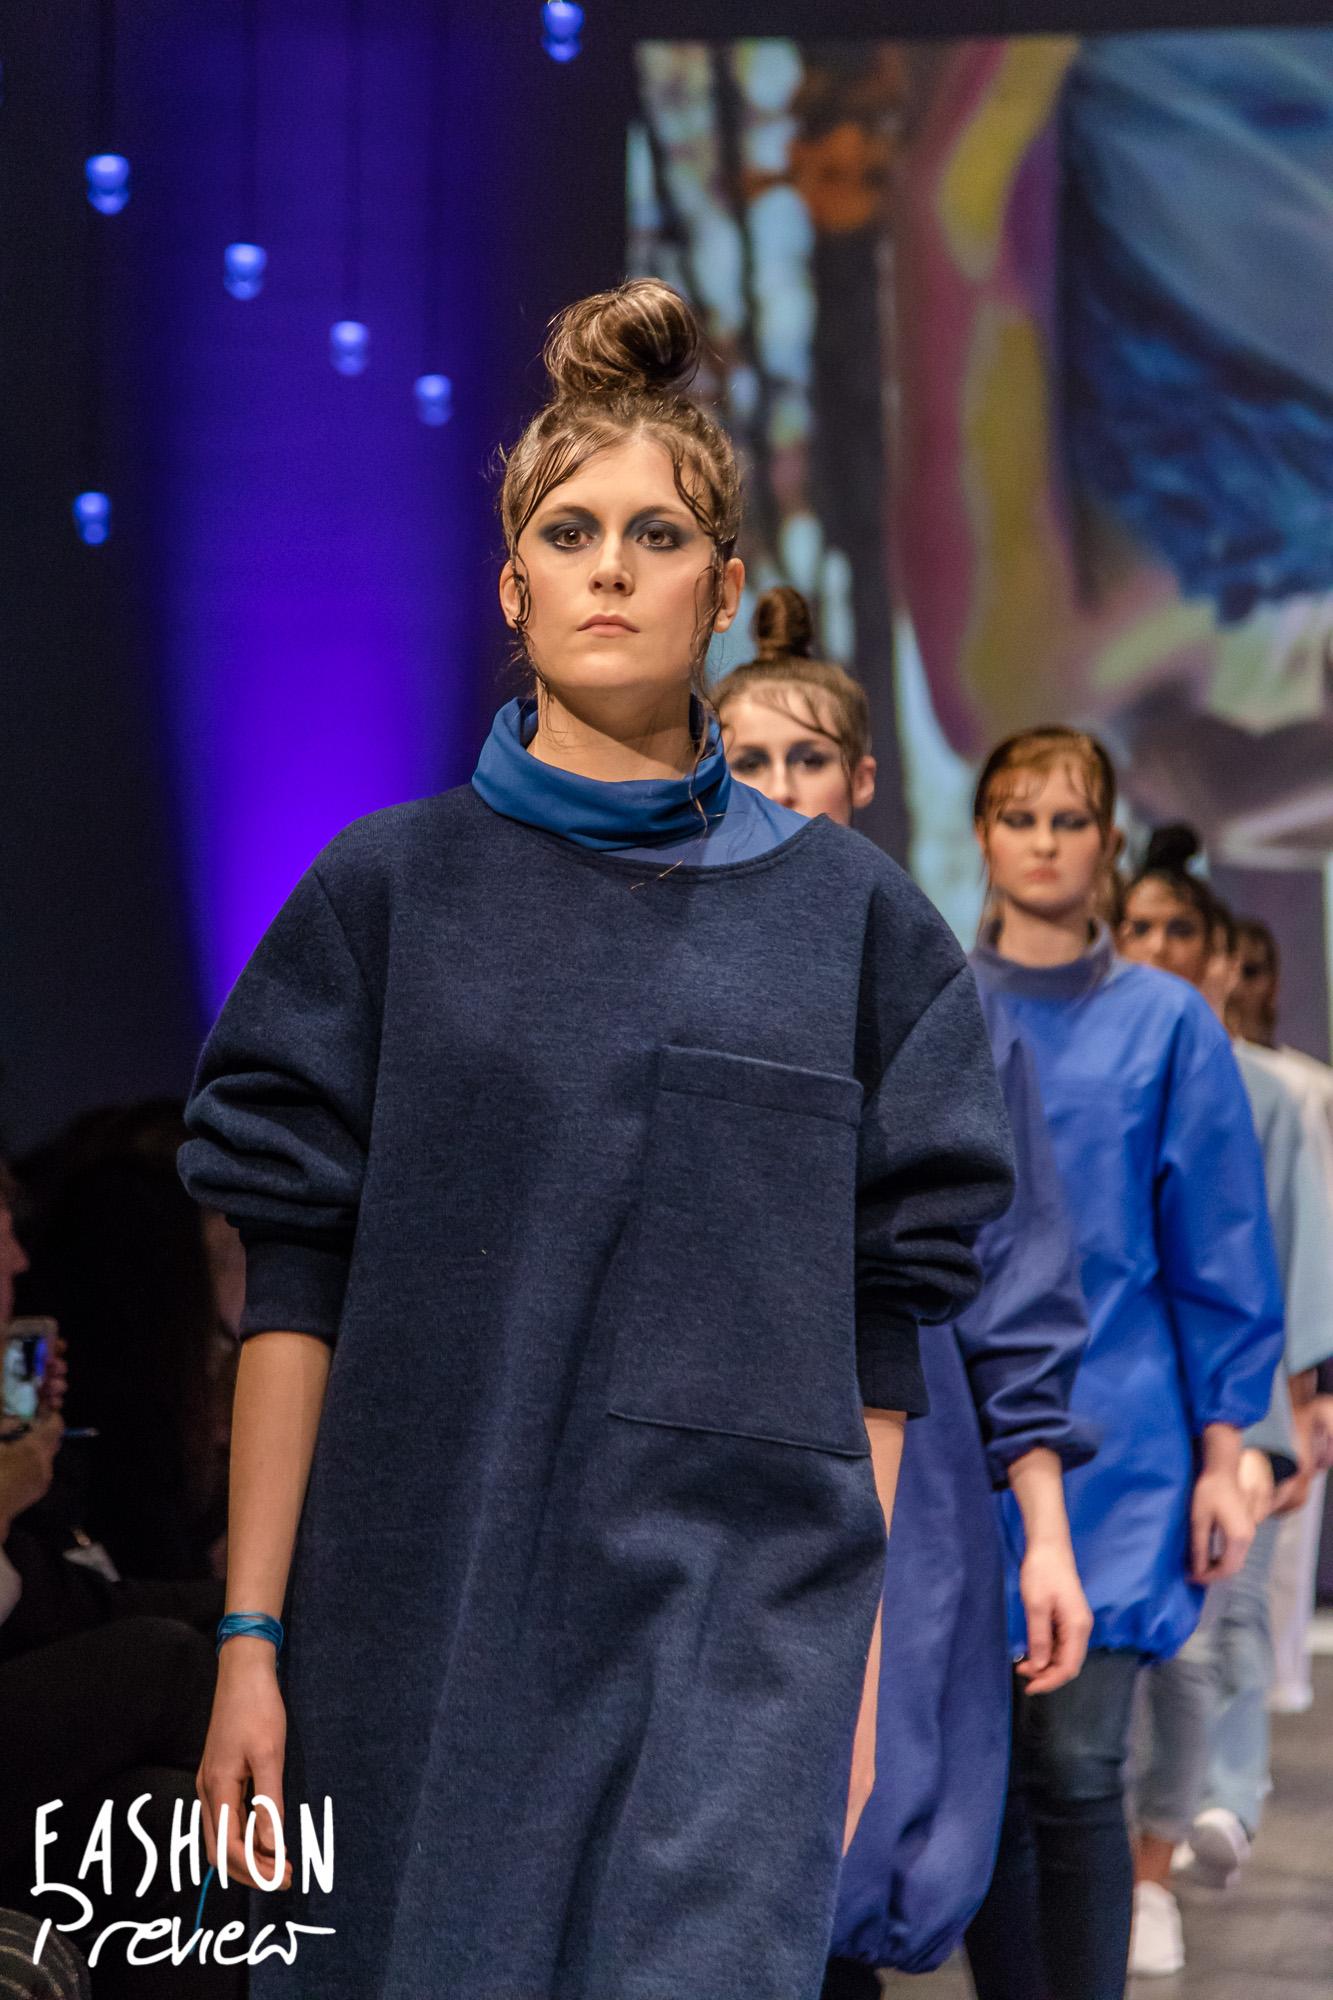 Fashion Preview 9 - Cegep Marie Victorin-02.jpg